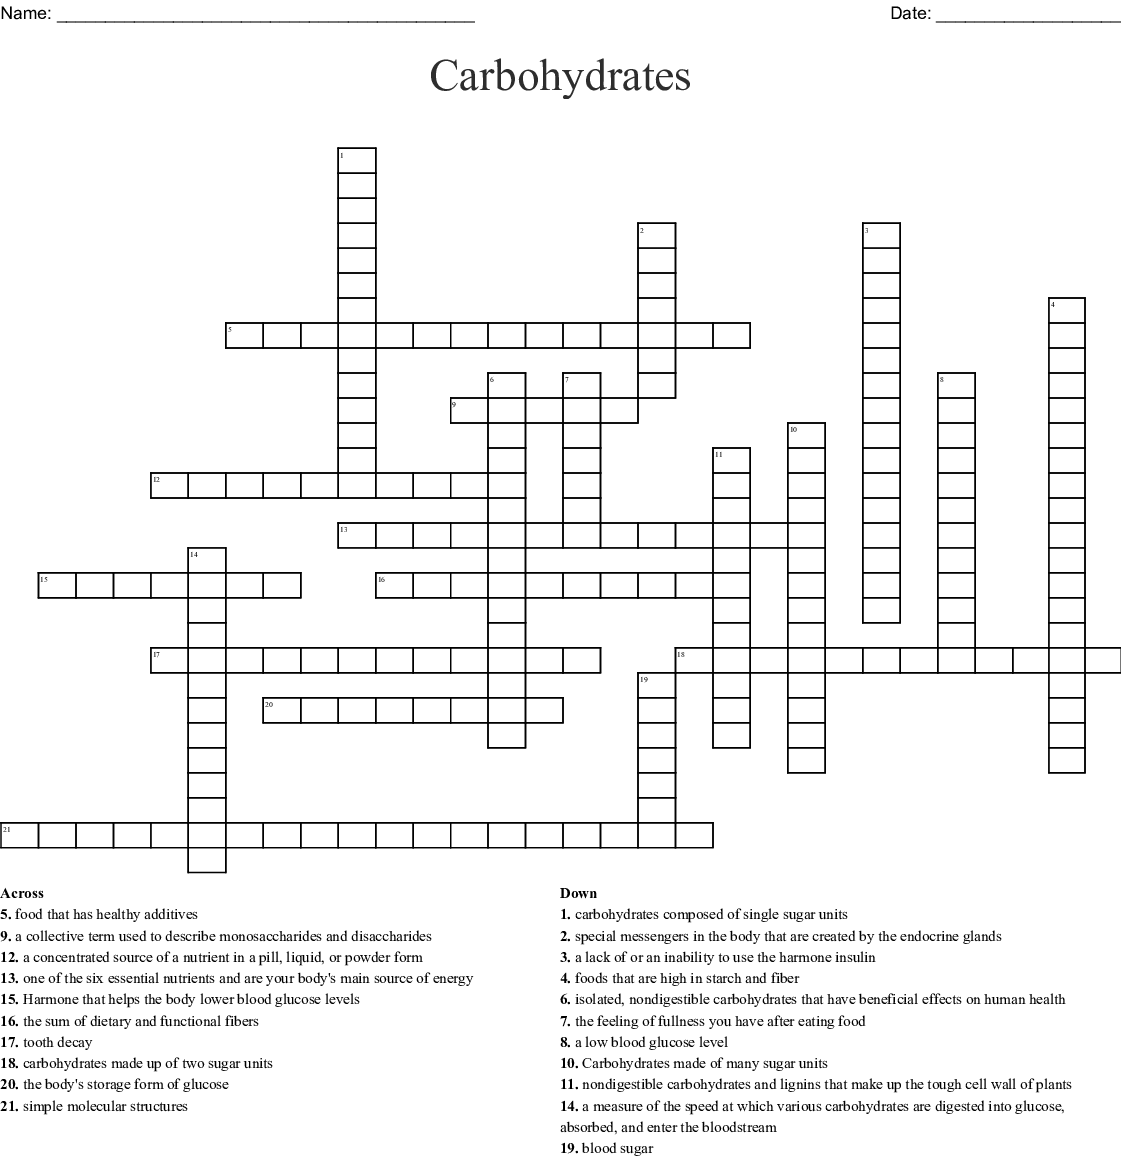 Carbohydrates Crossword